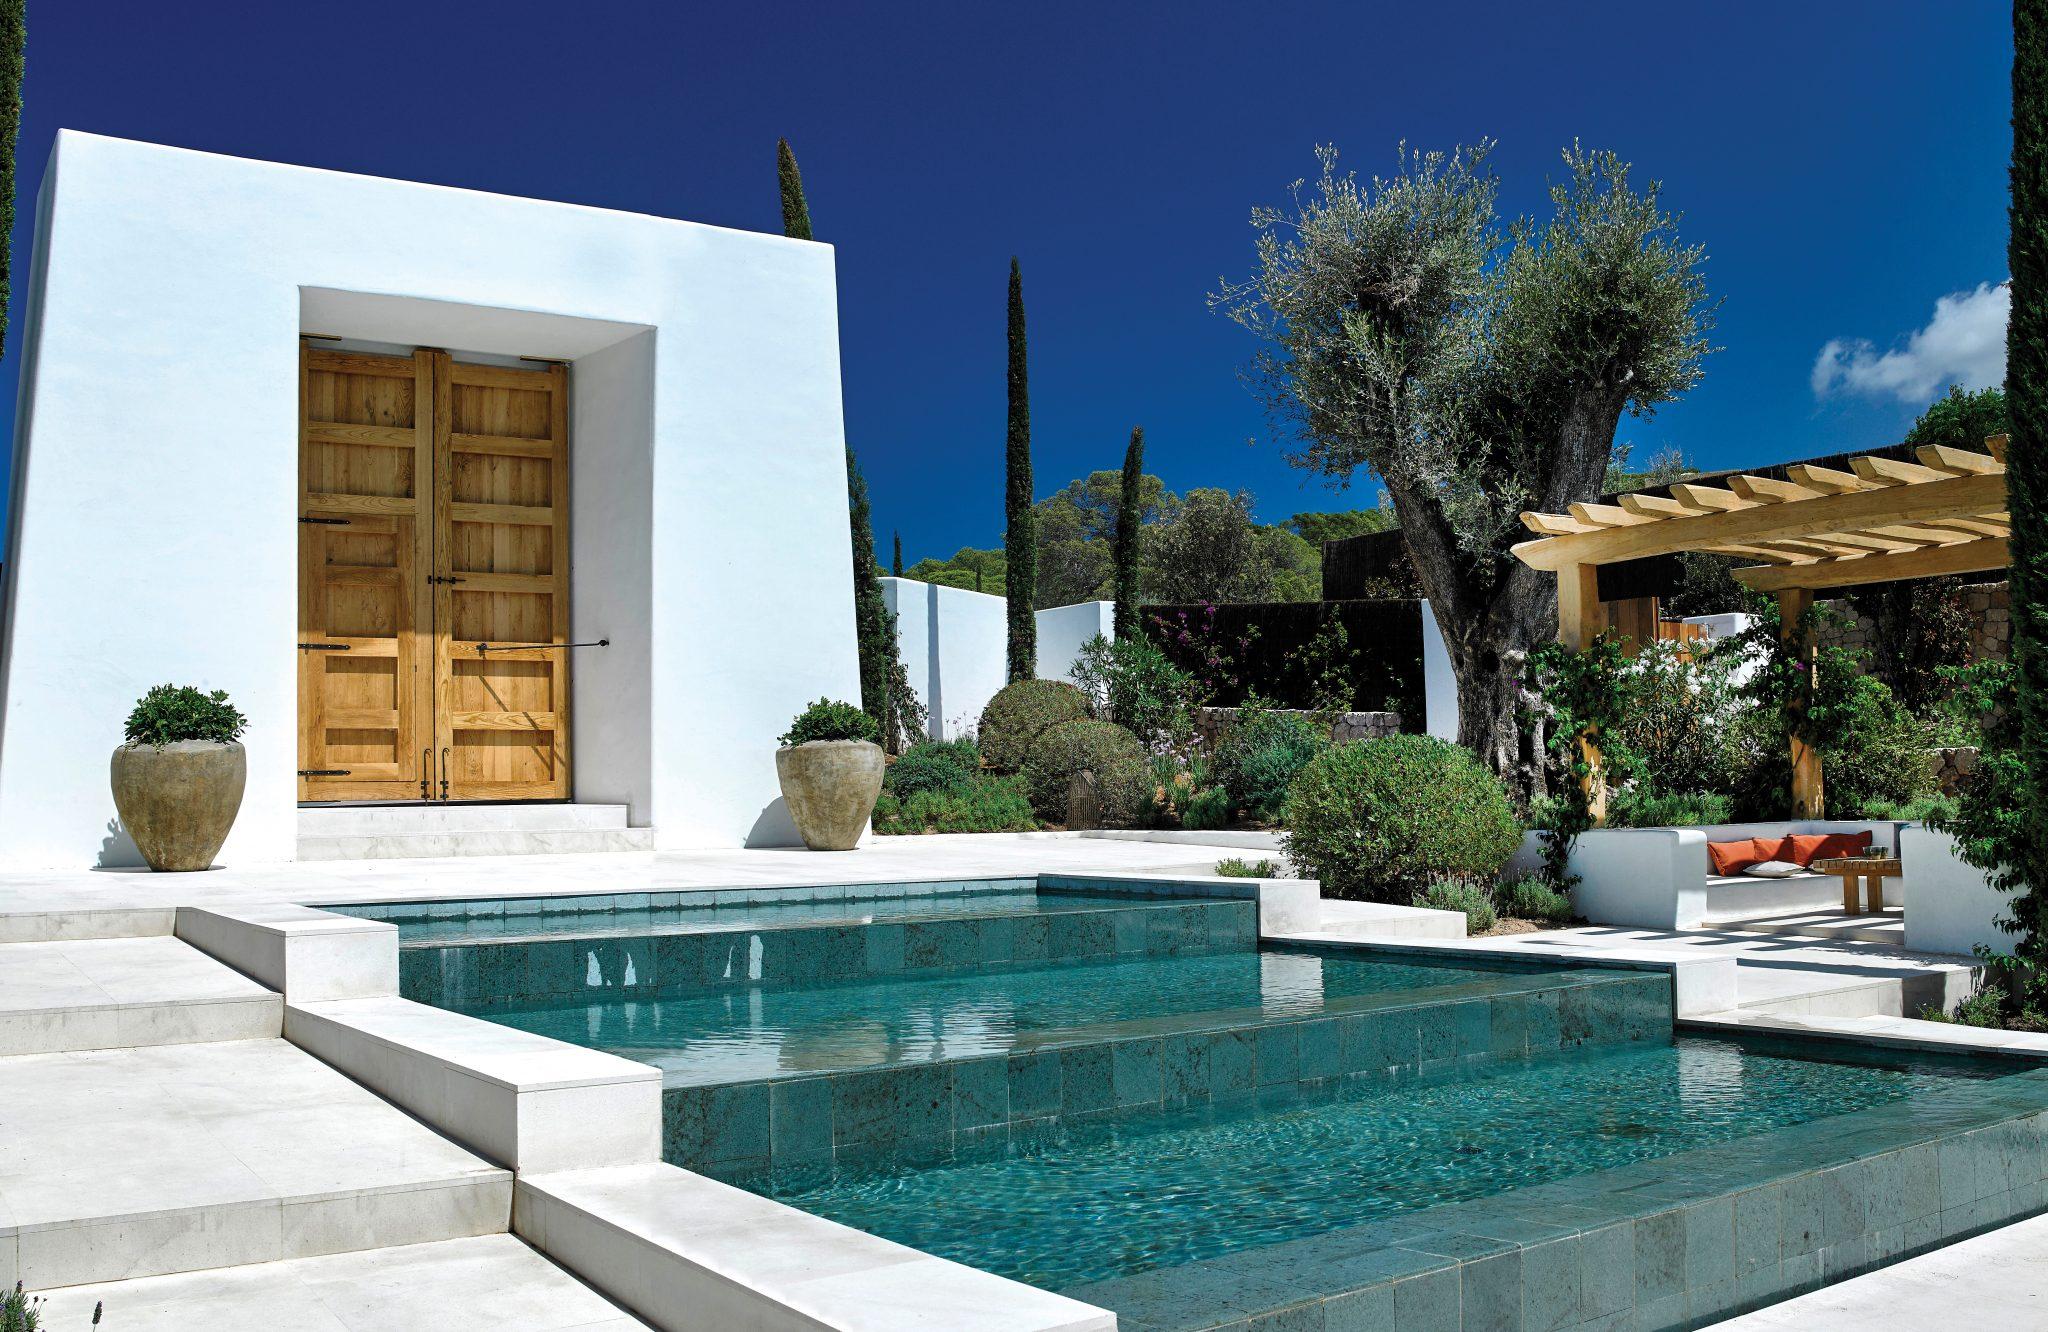 Sabina Ibiza spiritual home_The Clubhouse at Sabina Estates, a private villa community in southwest Ibiza.